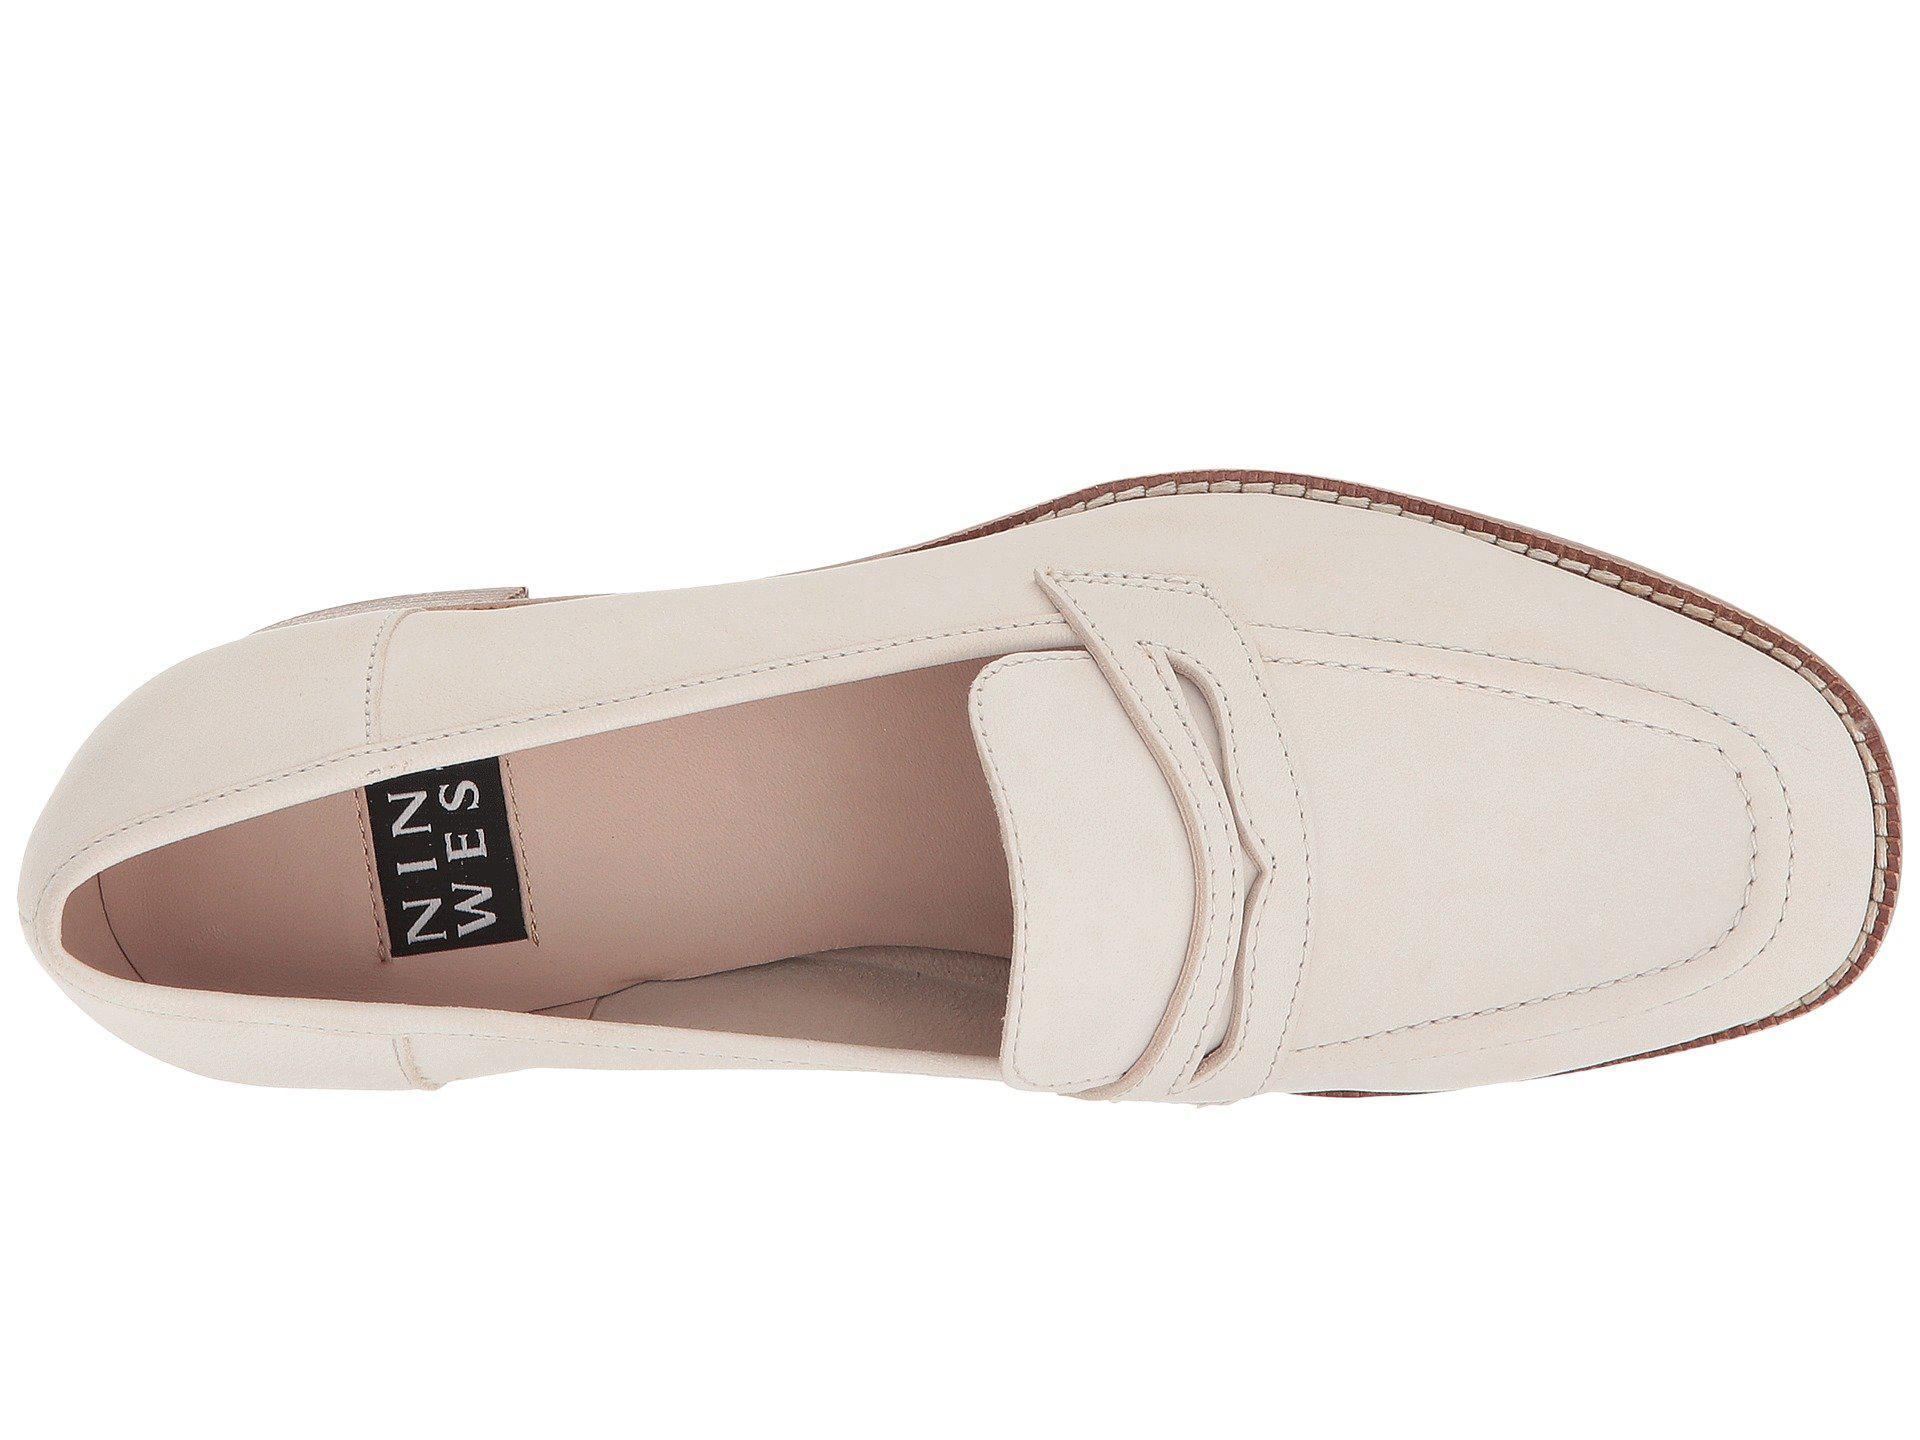 57b132213b0 Nine West - Multicolor Kimmy 40th Anniversary Heeled Loafer - Lyst. View  fullscreen